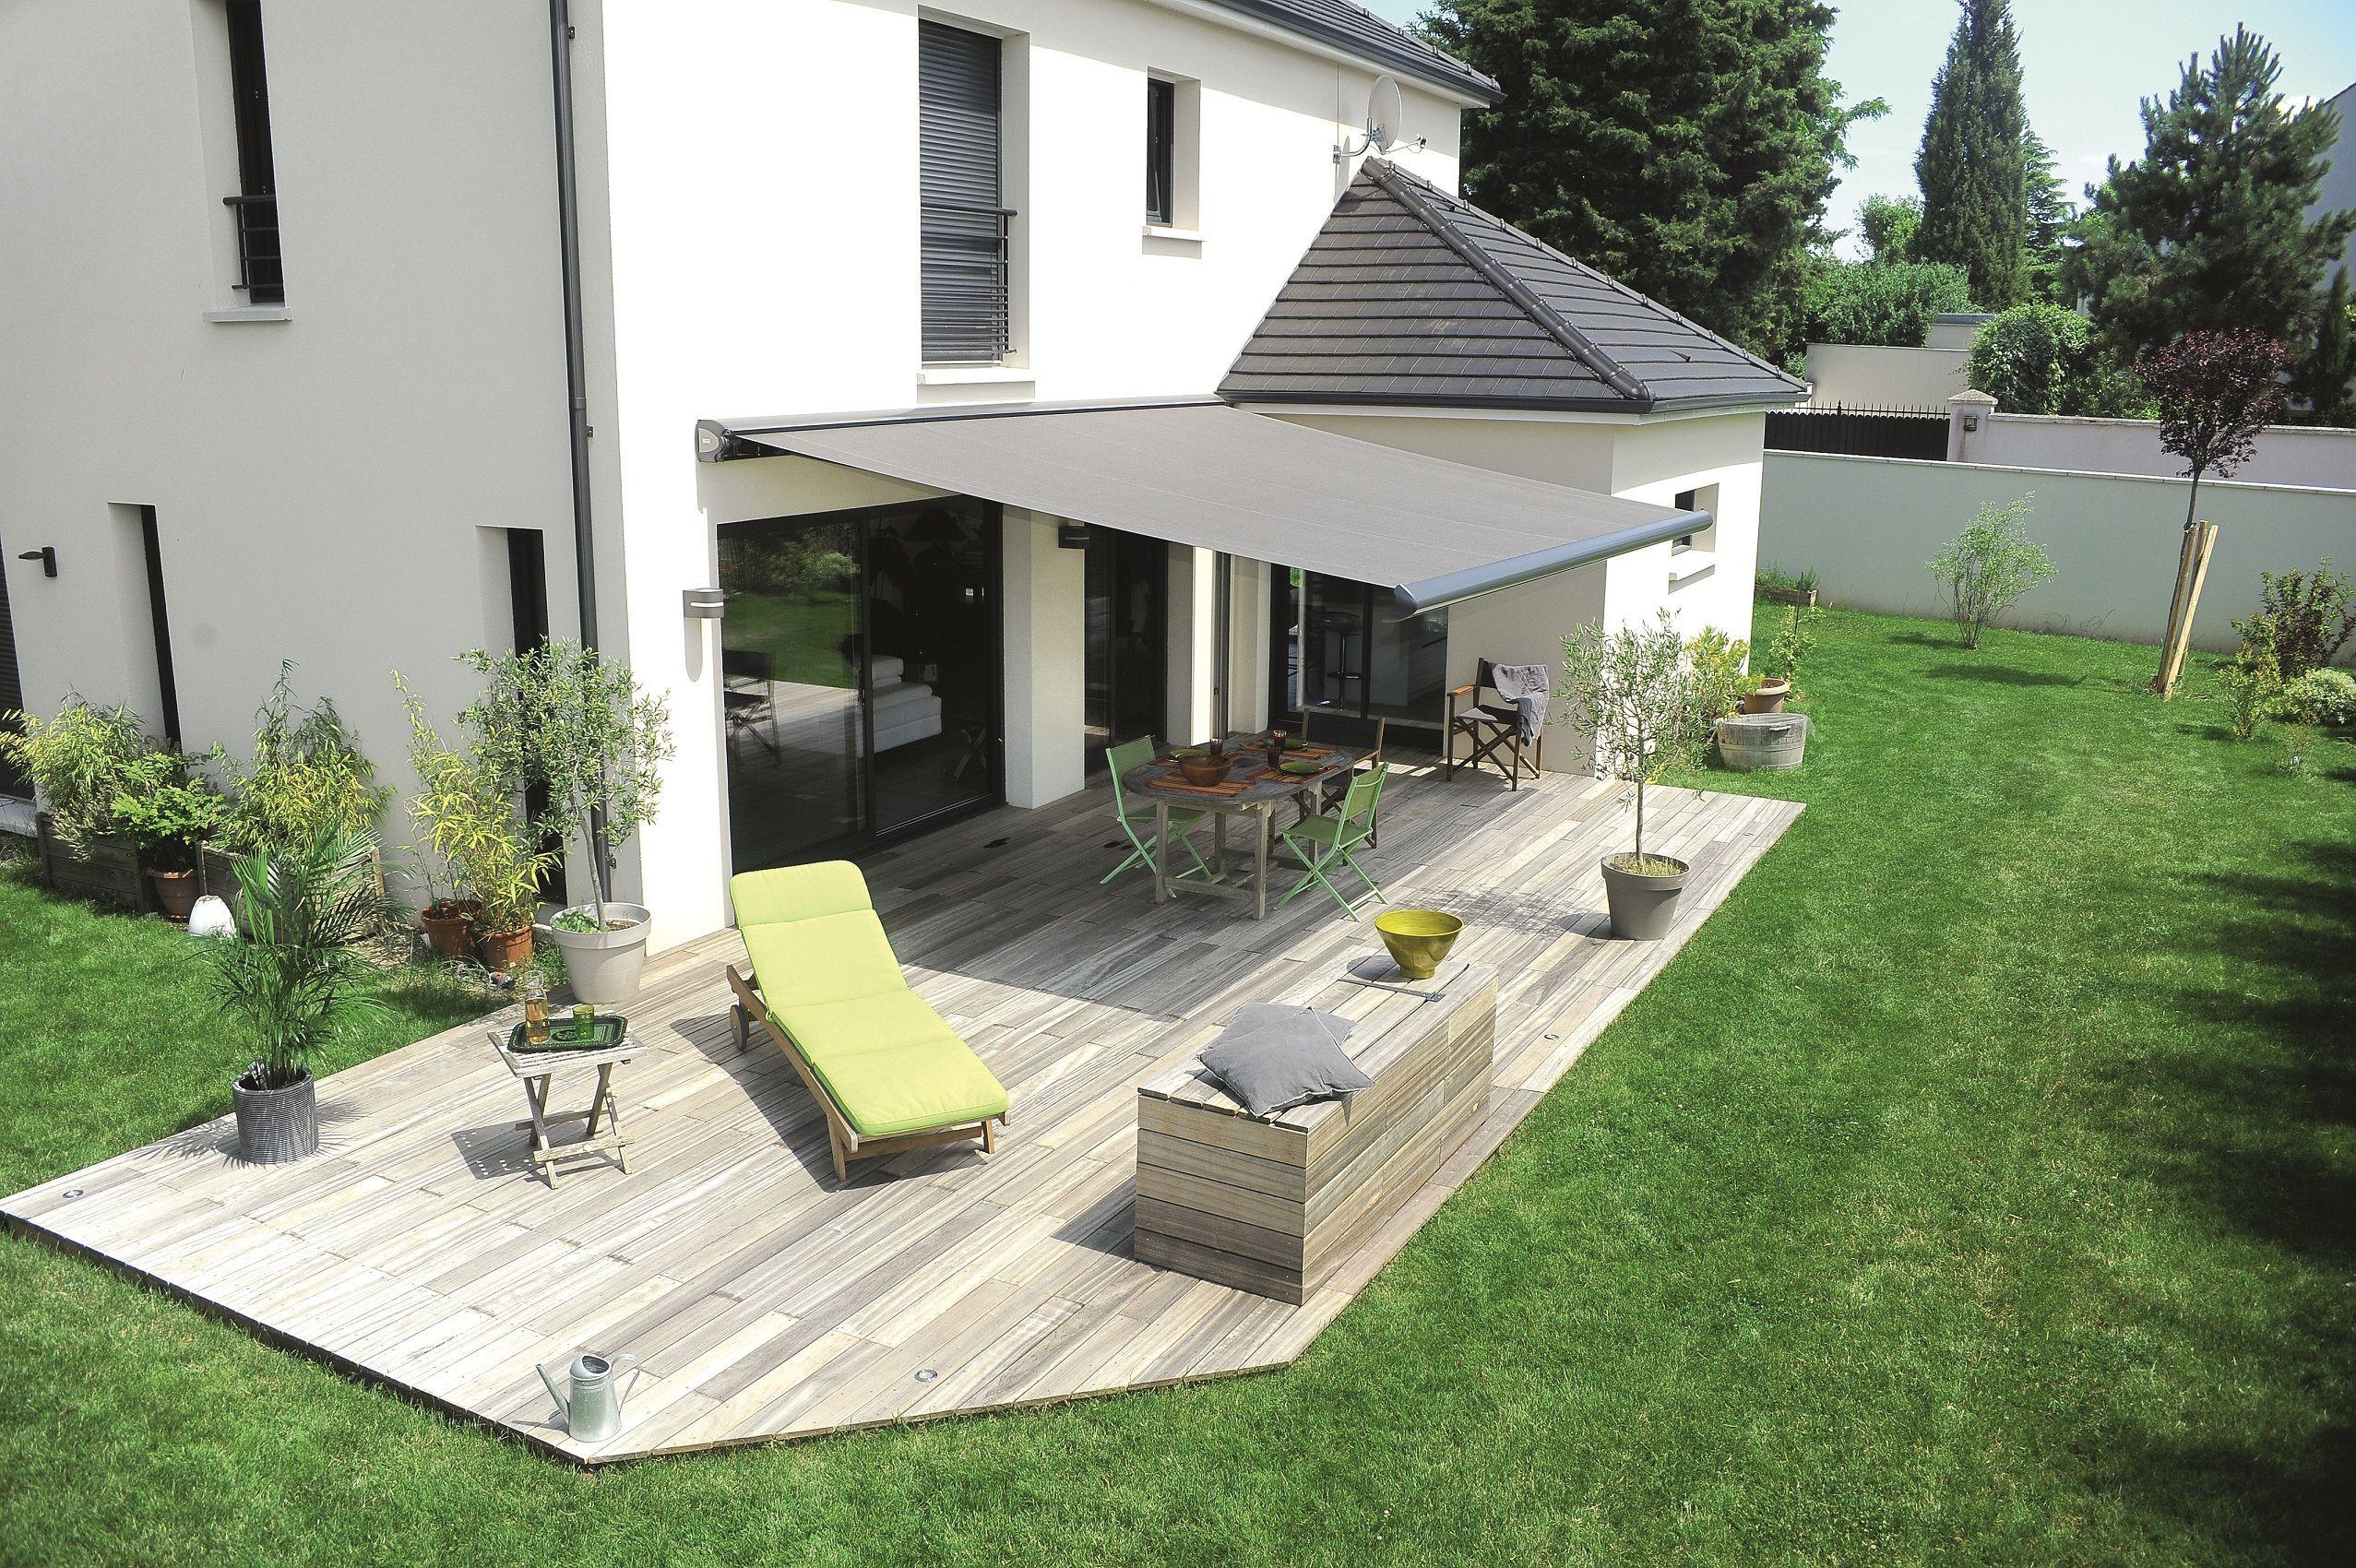 Storistesdefrance #store #terrasse #jardin #soleil ... avec Terrase De Jardin